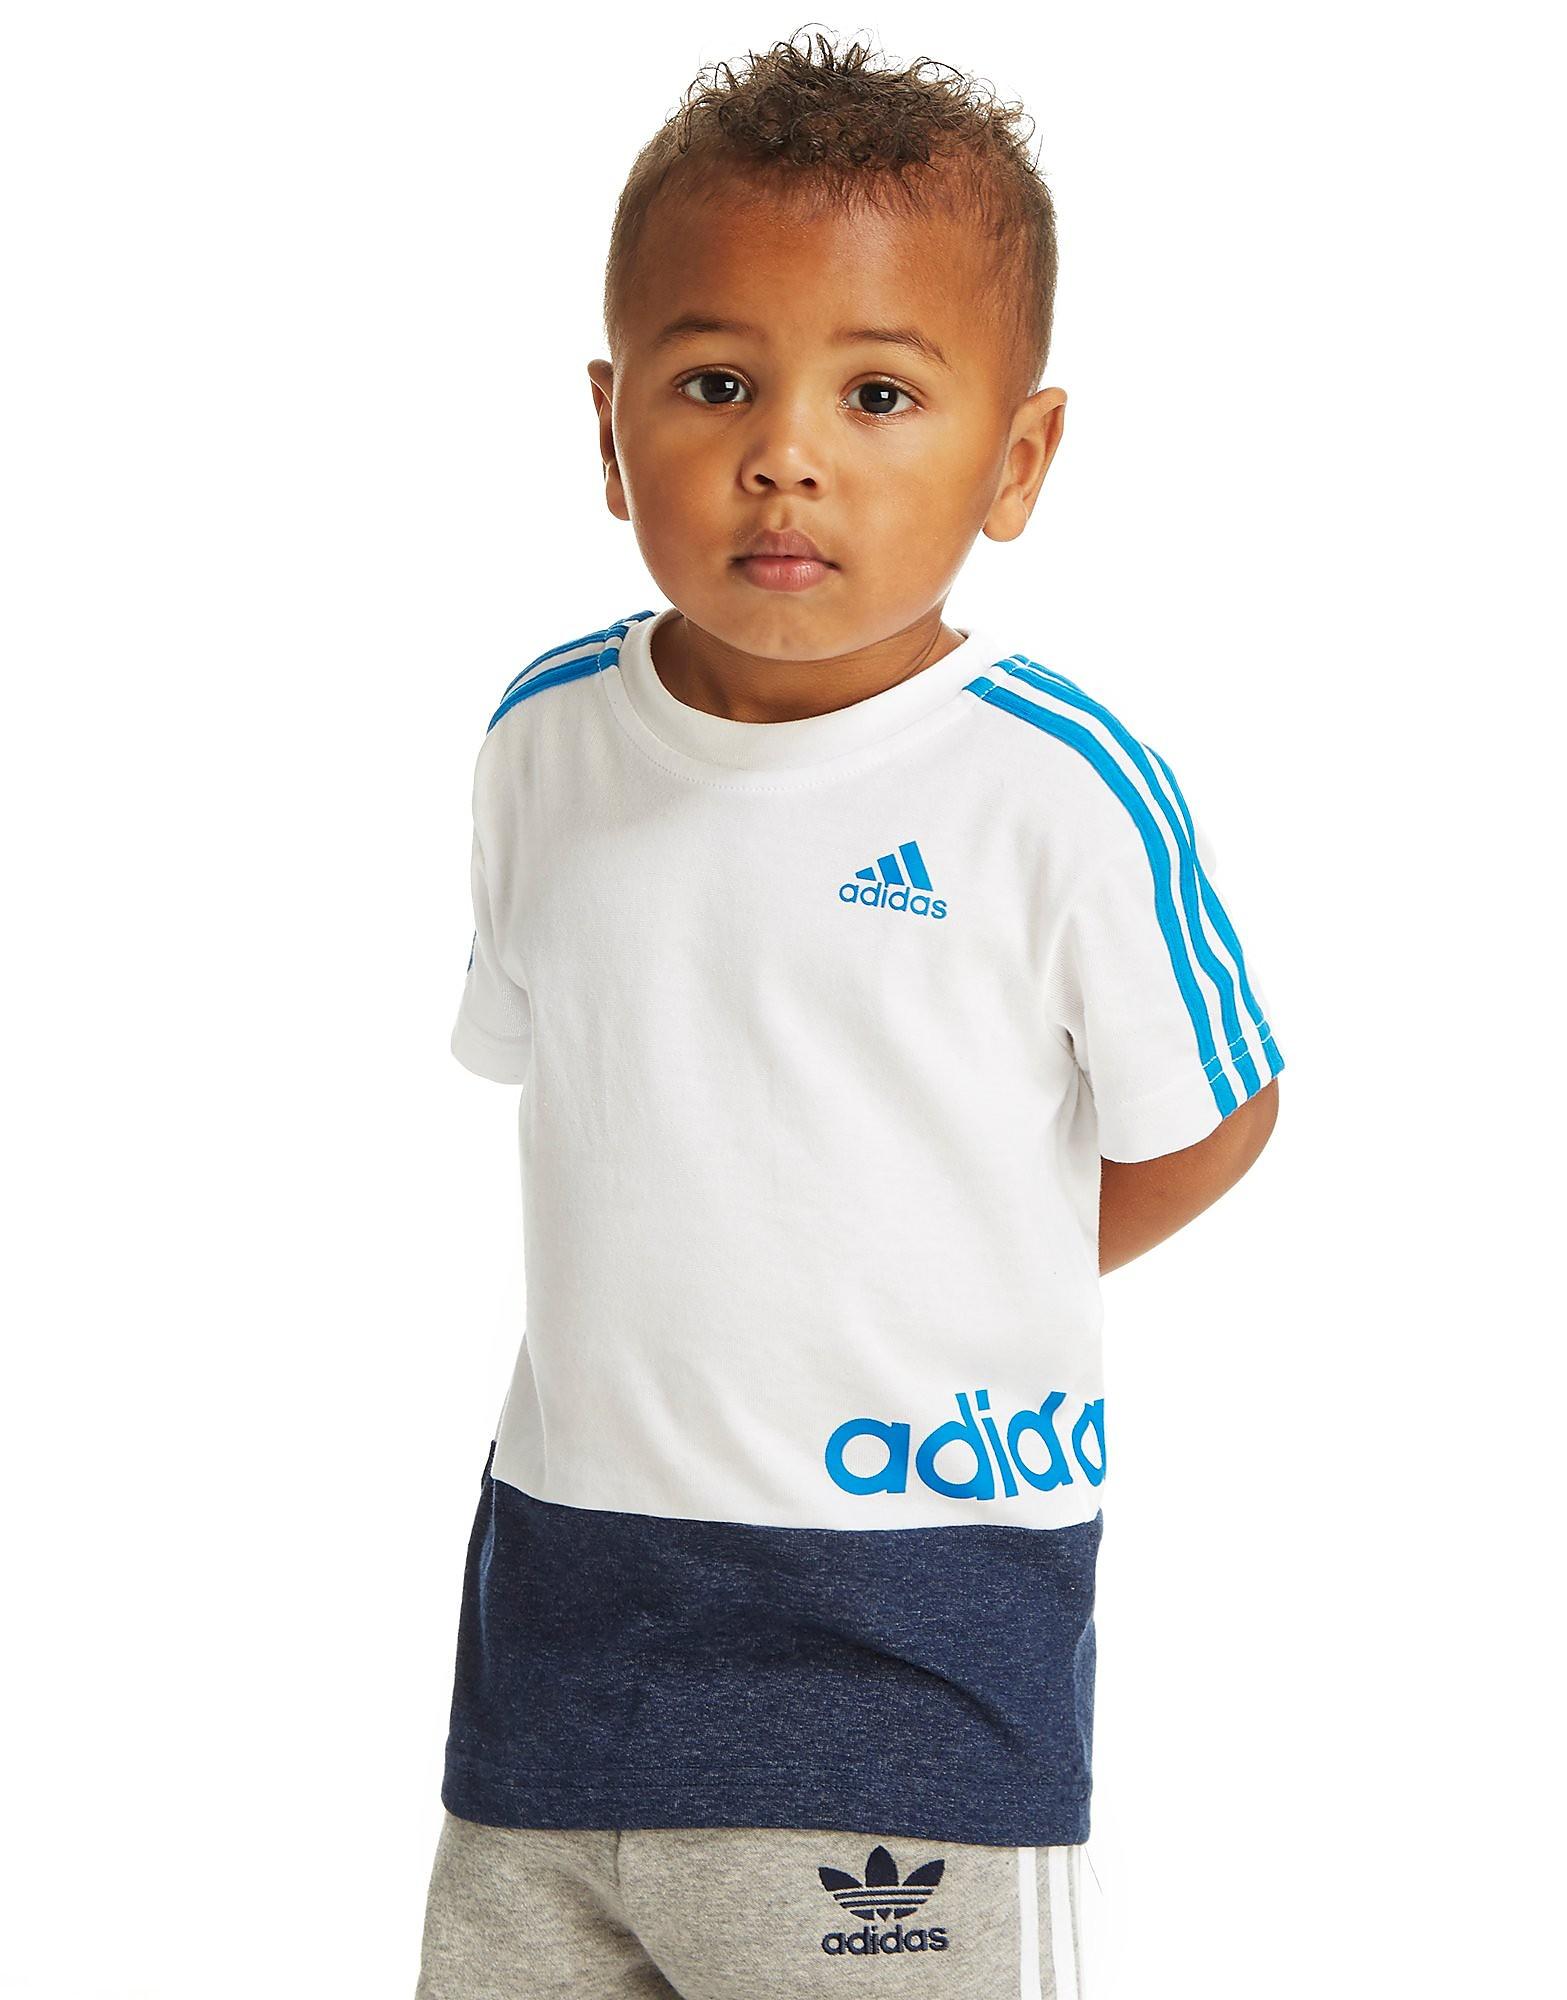 adidas Linear-t-shirt med farveblok – små børn